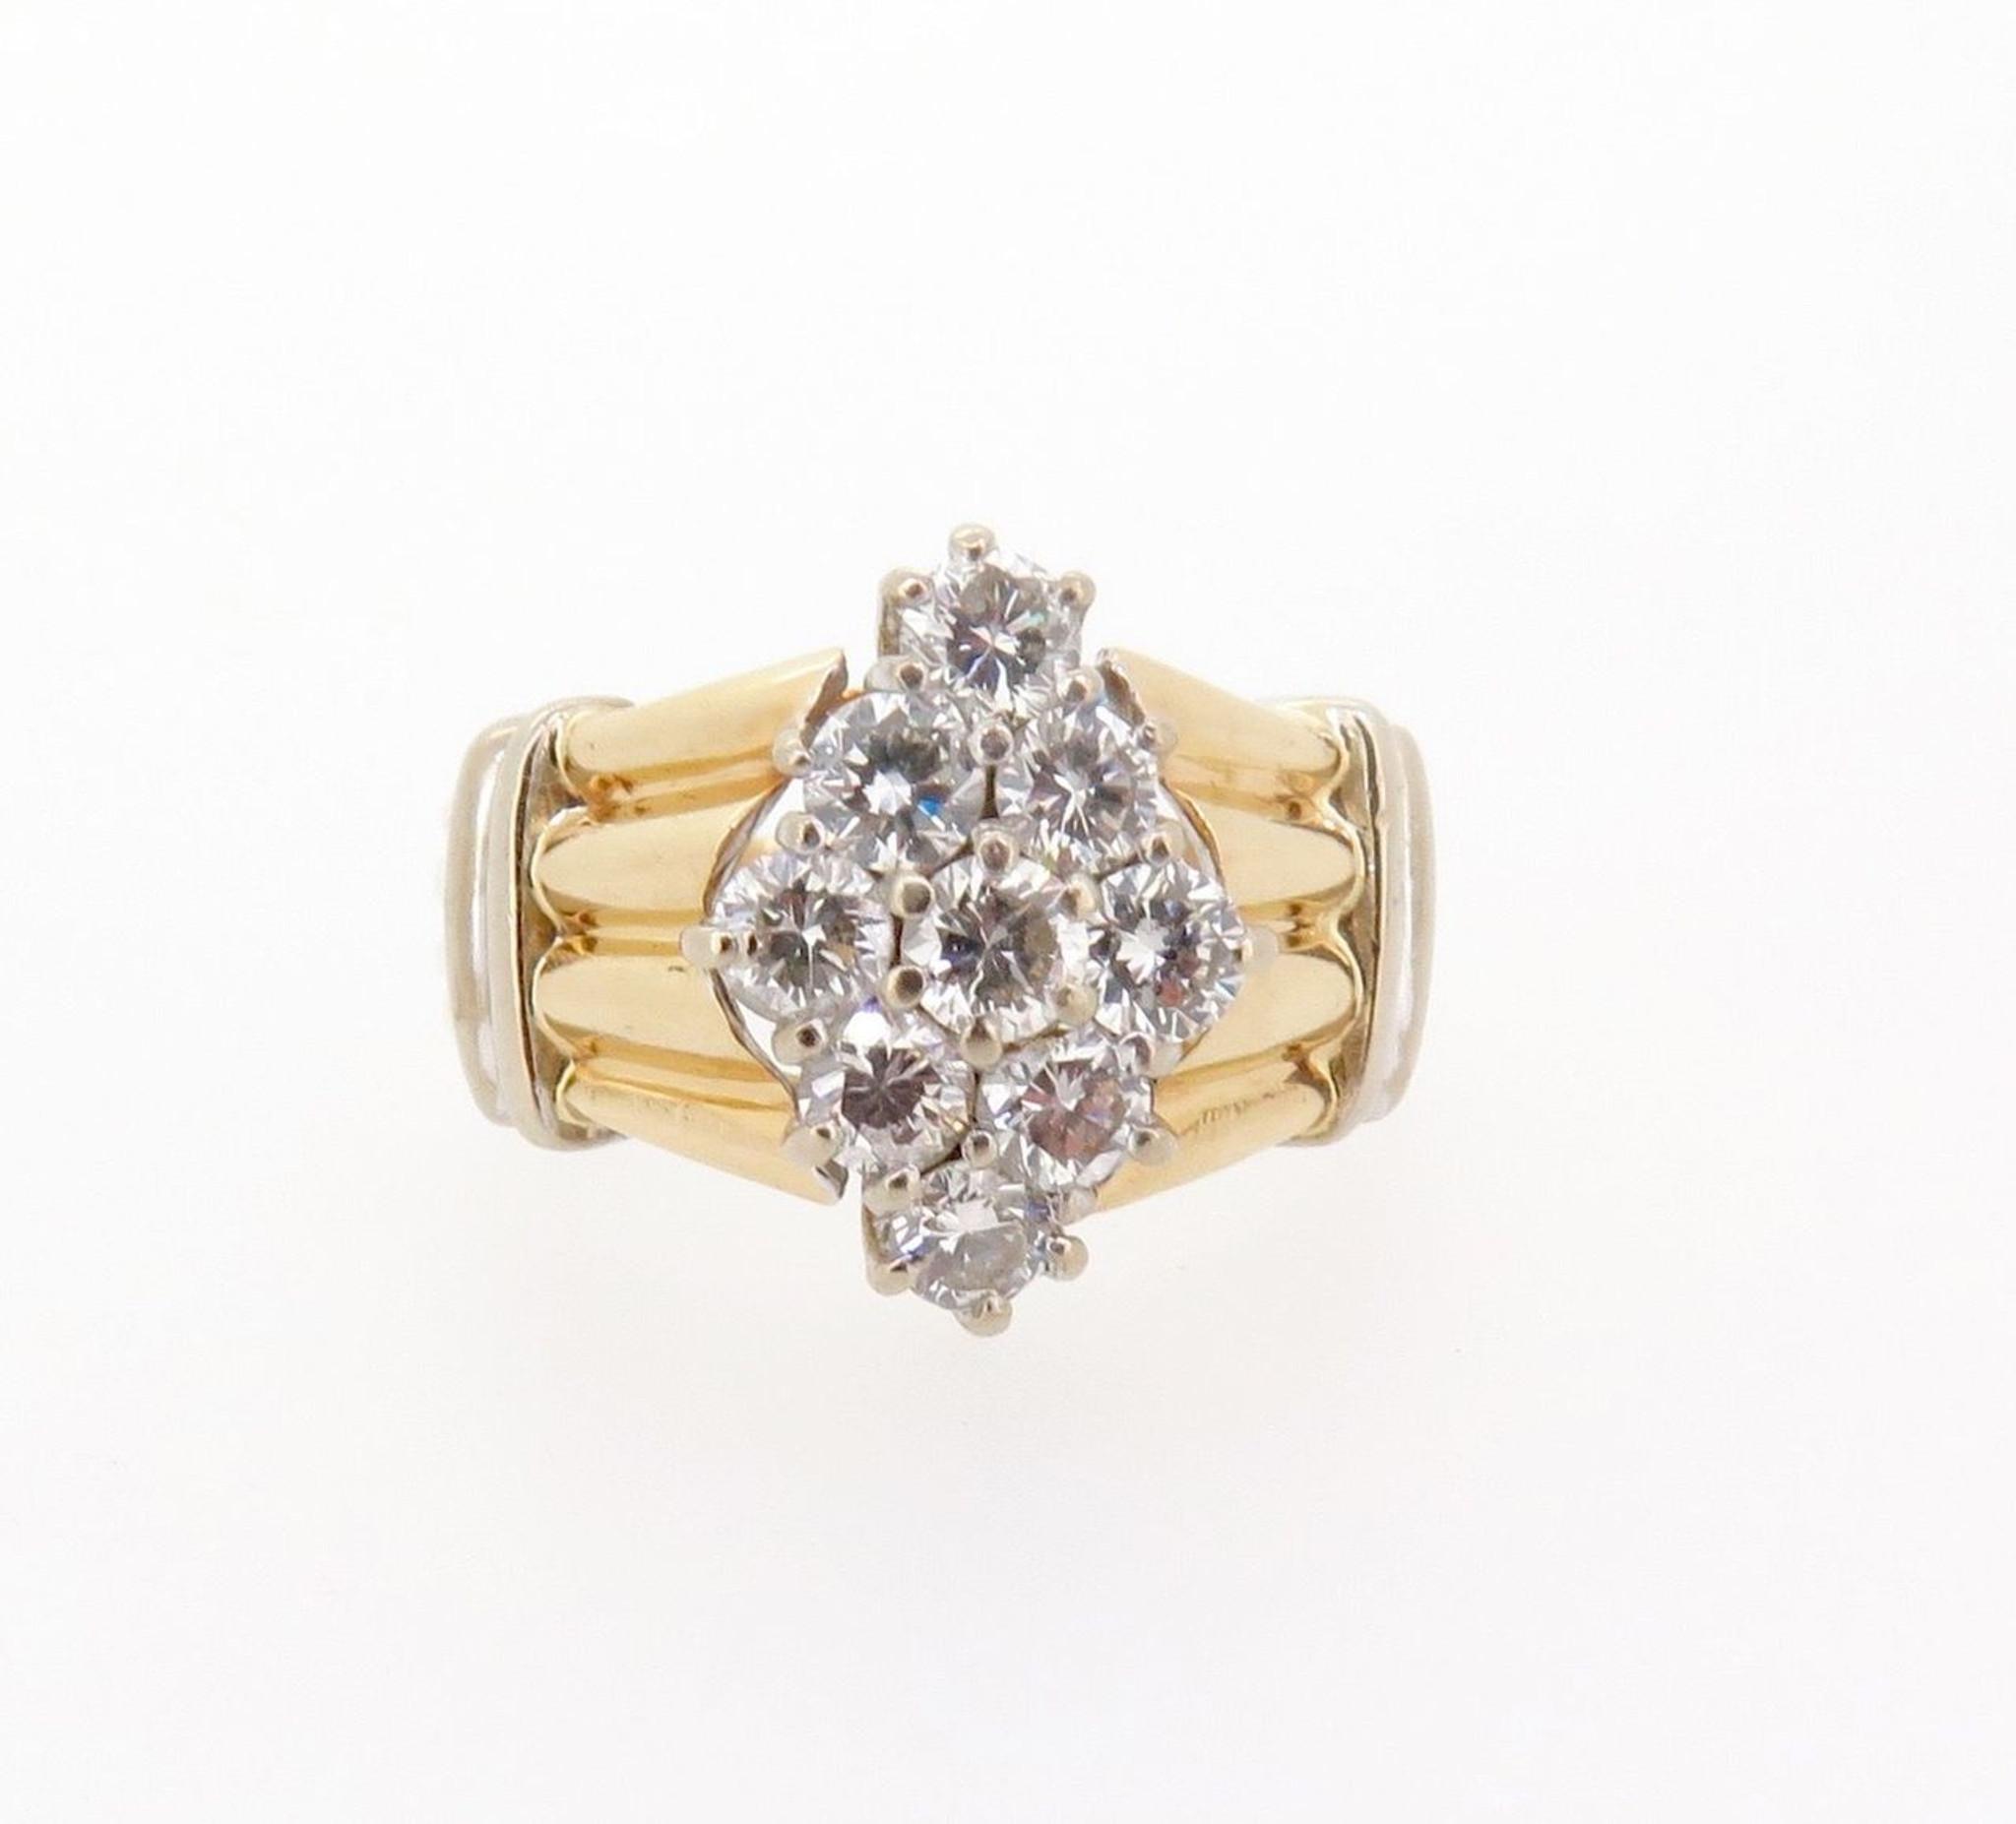 ct H VS-SI 14ct yellow gold ladies diamond dress ring val $5215